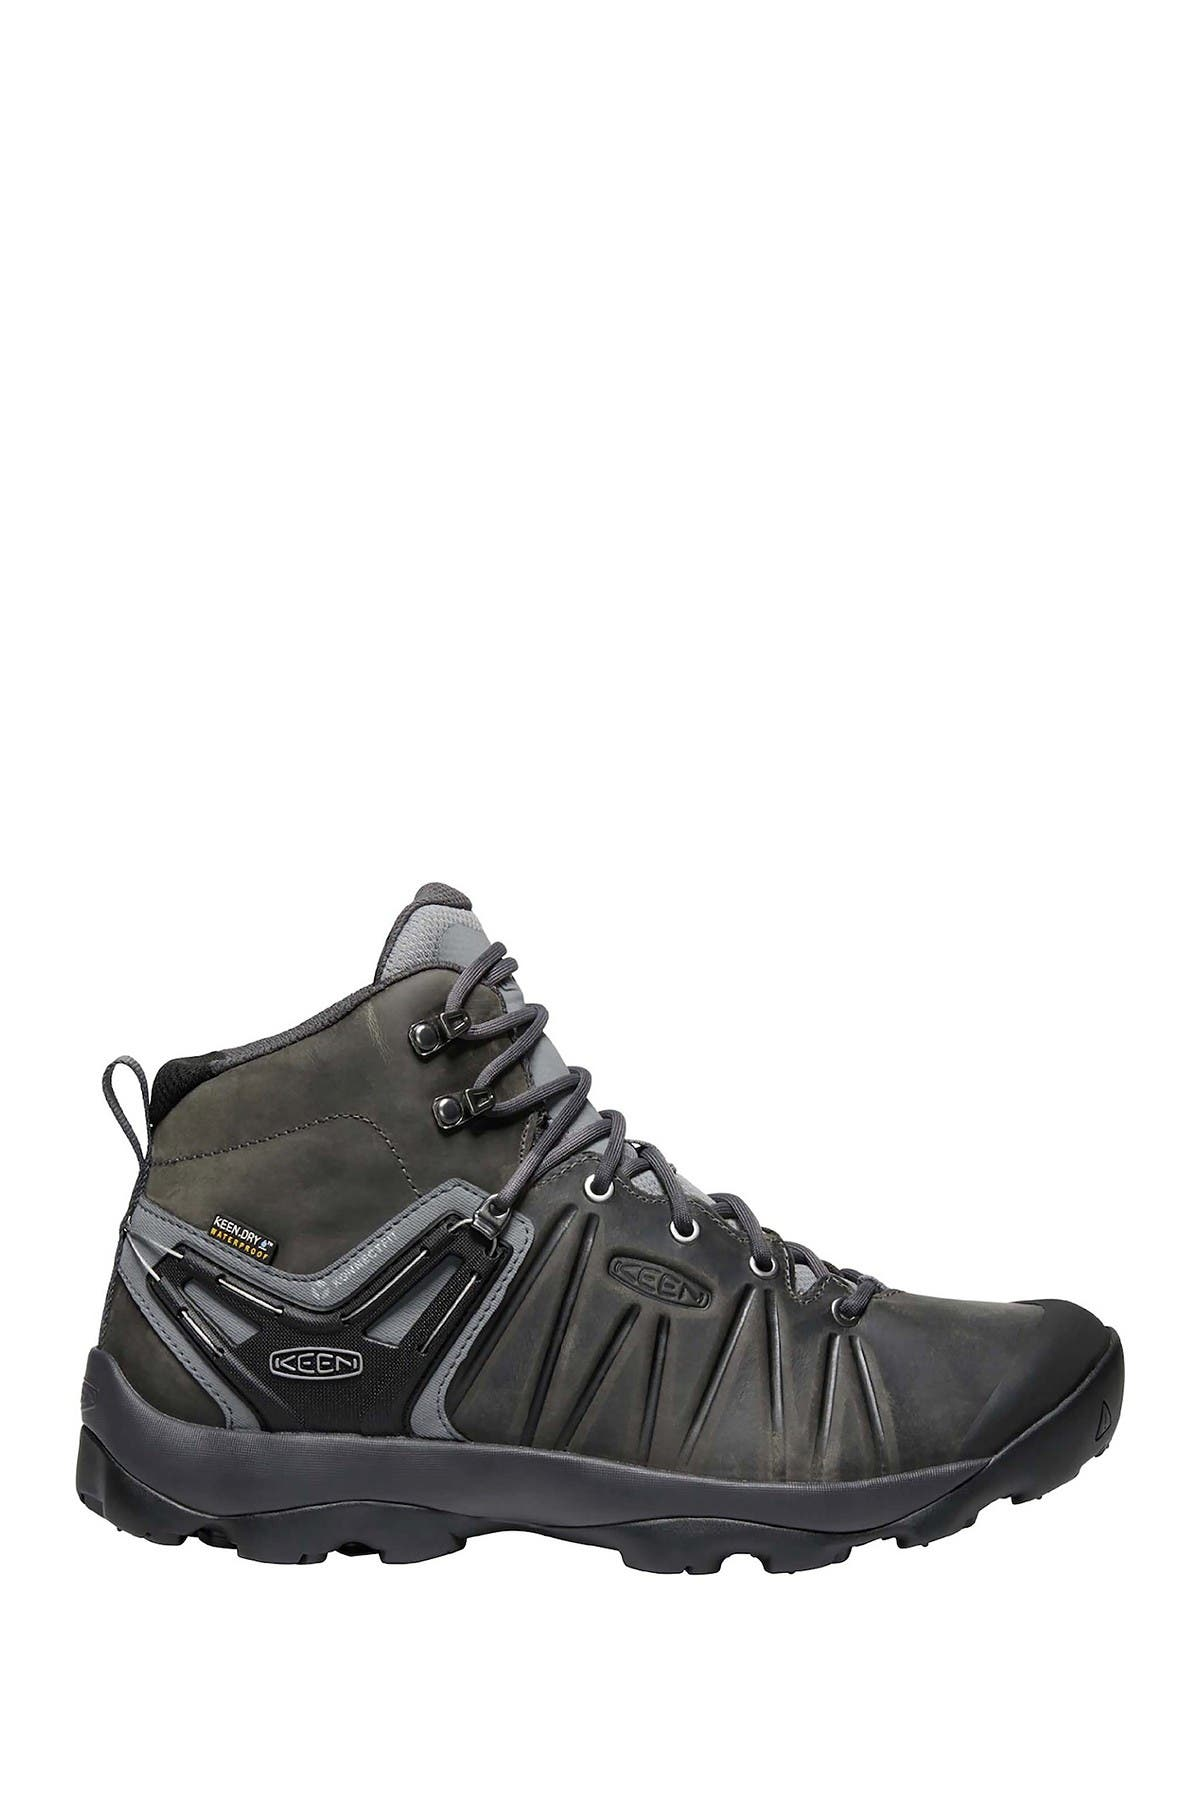 Image of Keen Venture Leather Mid Waterproof Boot